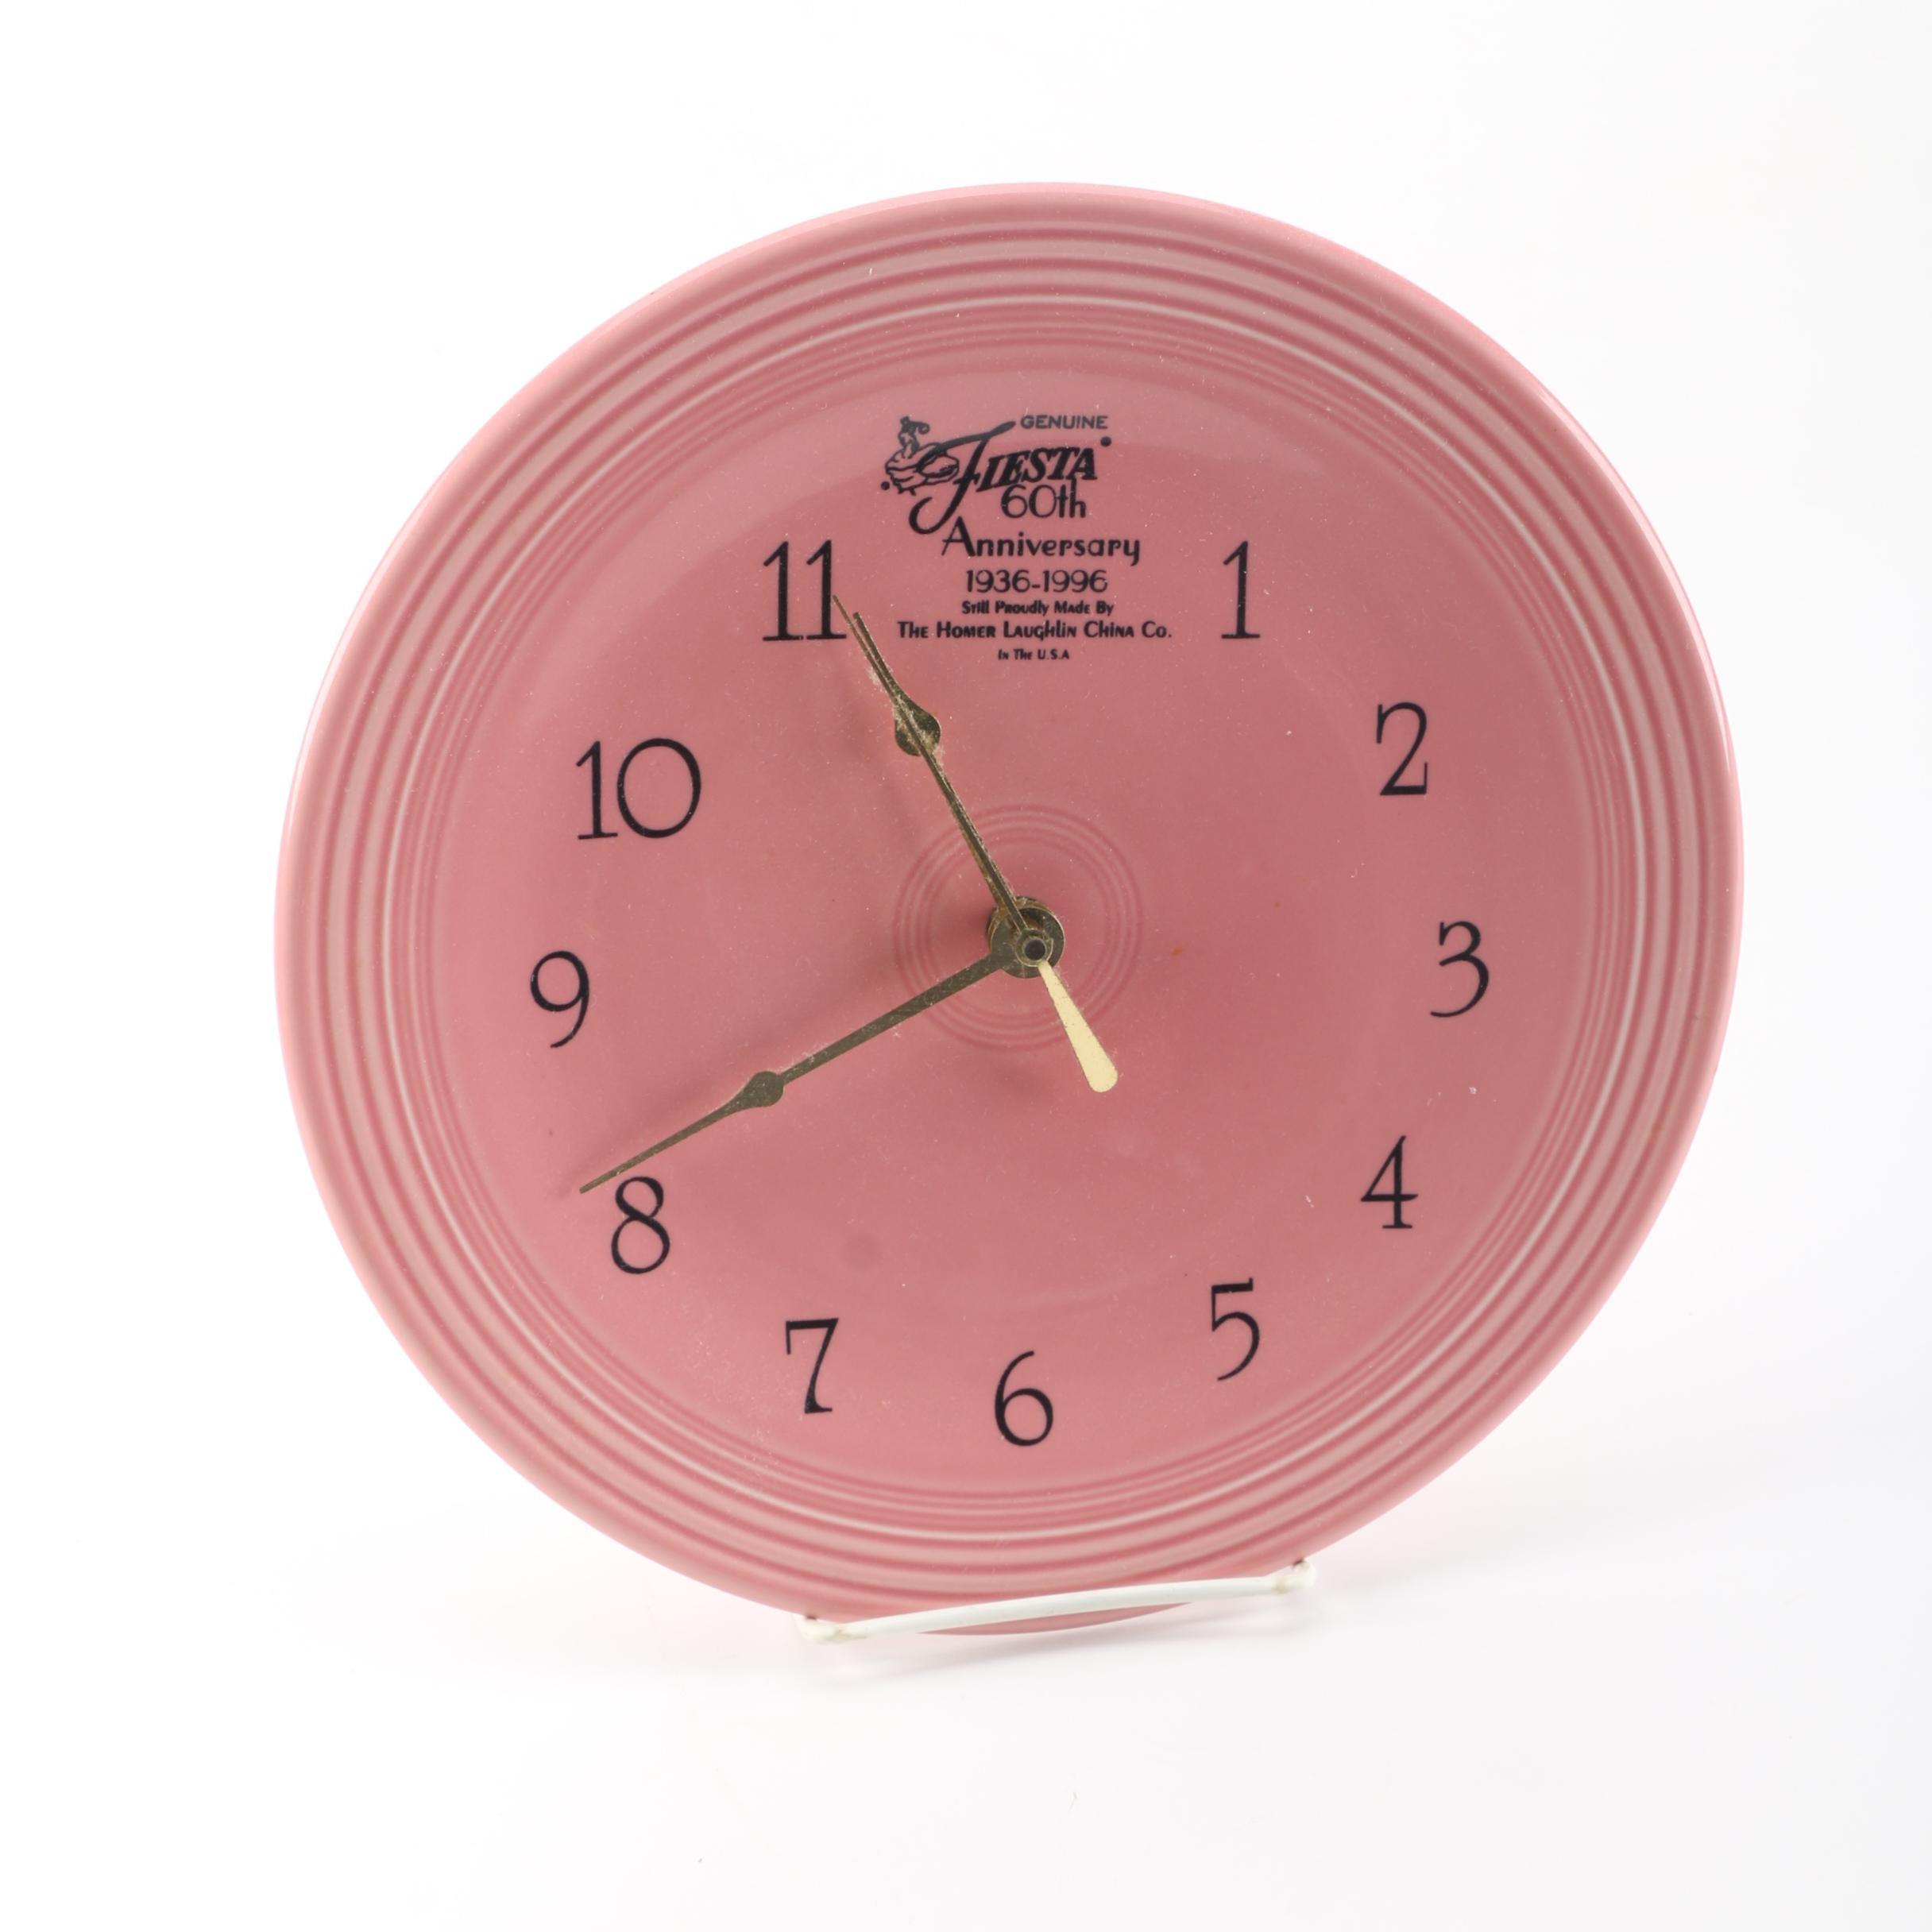 Homer Laughlin Fiesta 60th Anniversary Plate Wall Clock